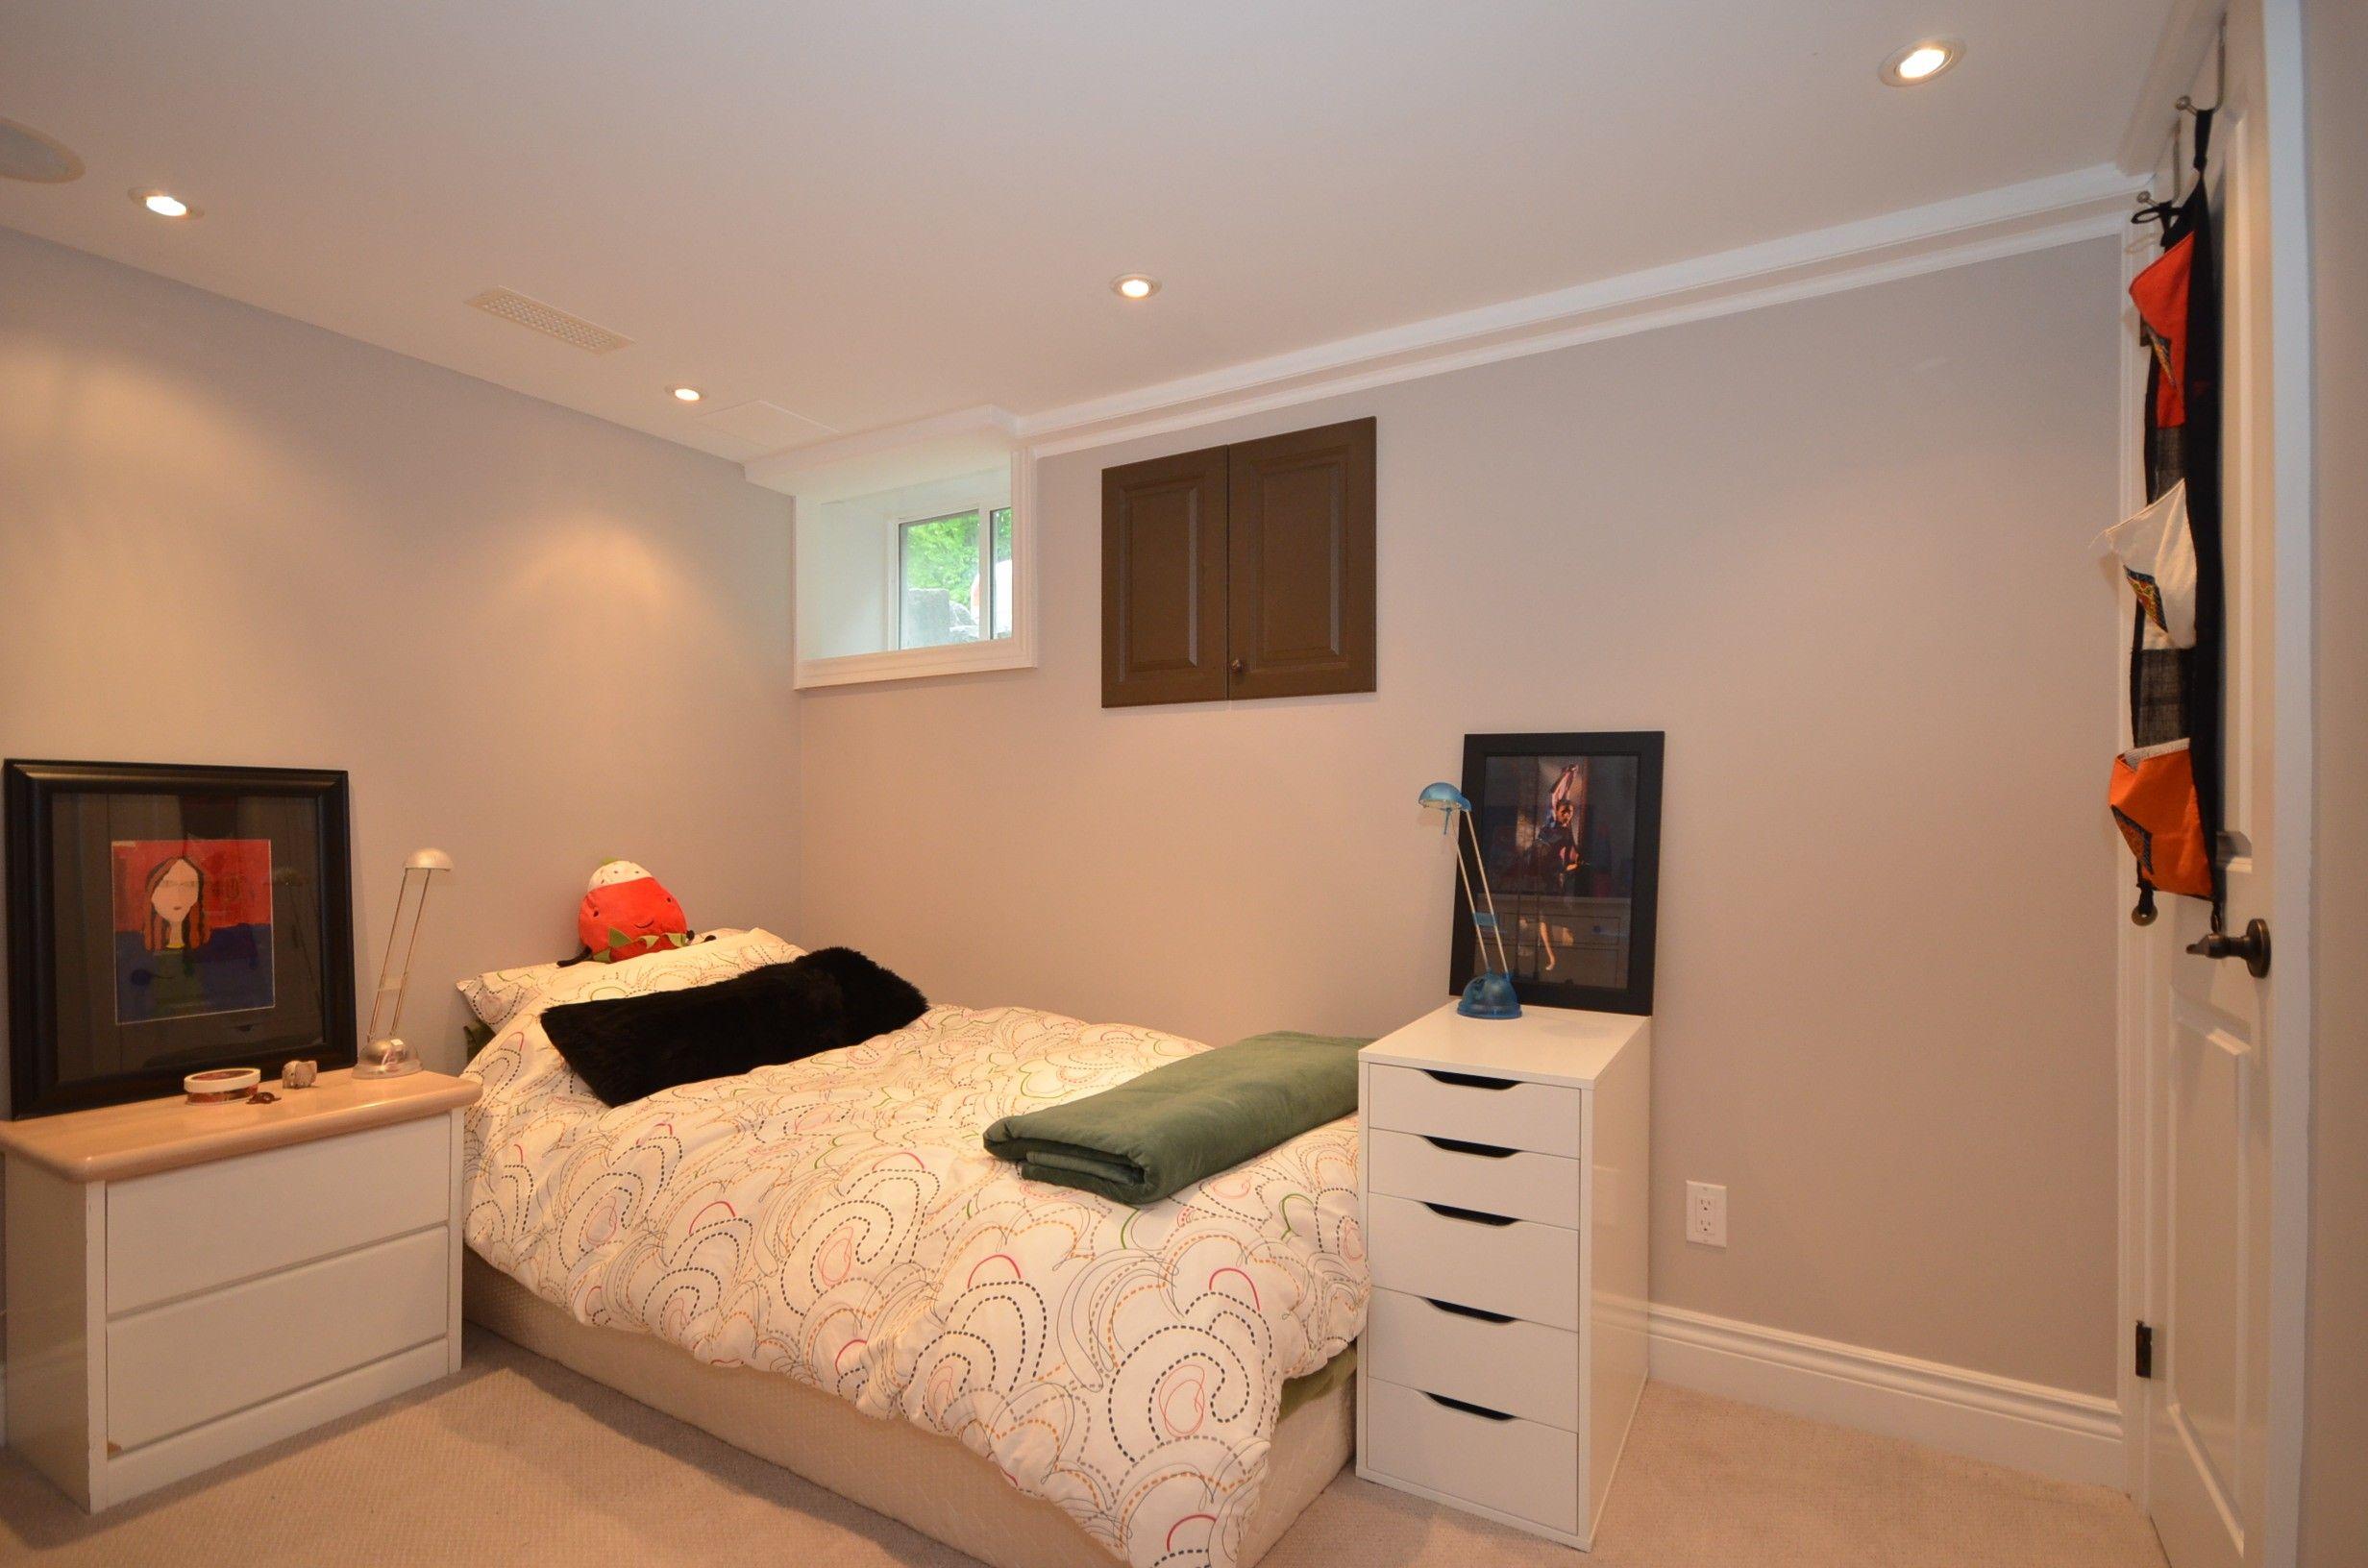 superb Wonderful Small Basement Bedroom Ideas Fresh In Ideas Gallery